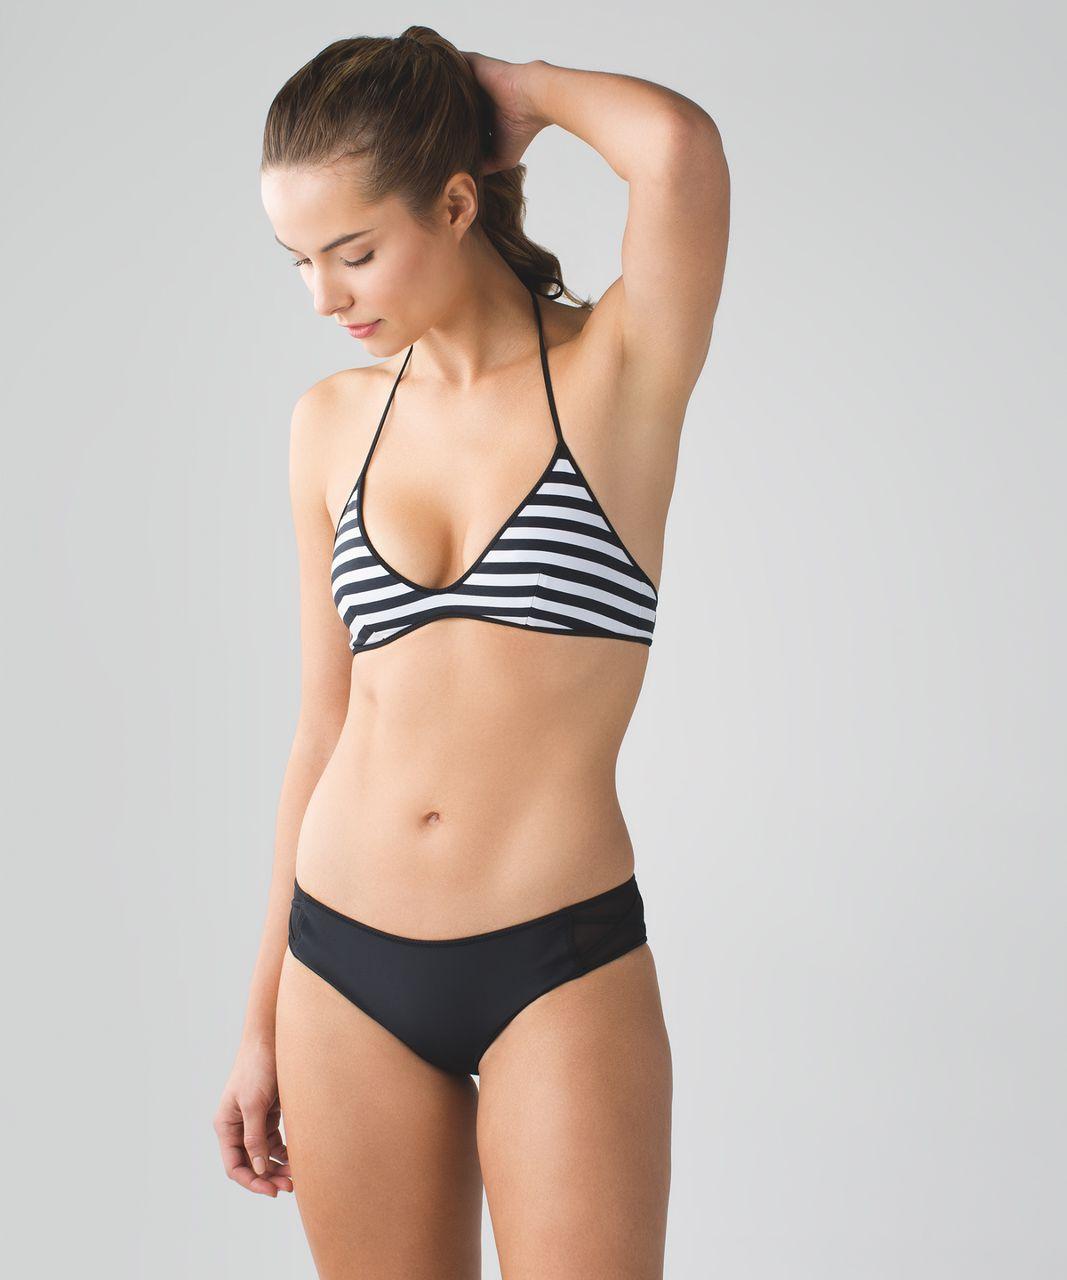 Lululemon Water:  Surf To Sand Tie Top - Black / Narrow Bold Stripe Printed White Black